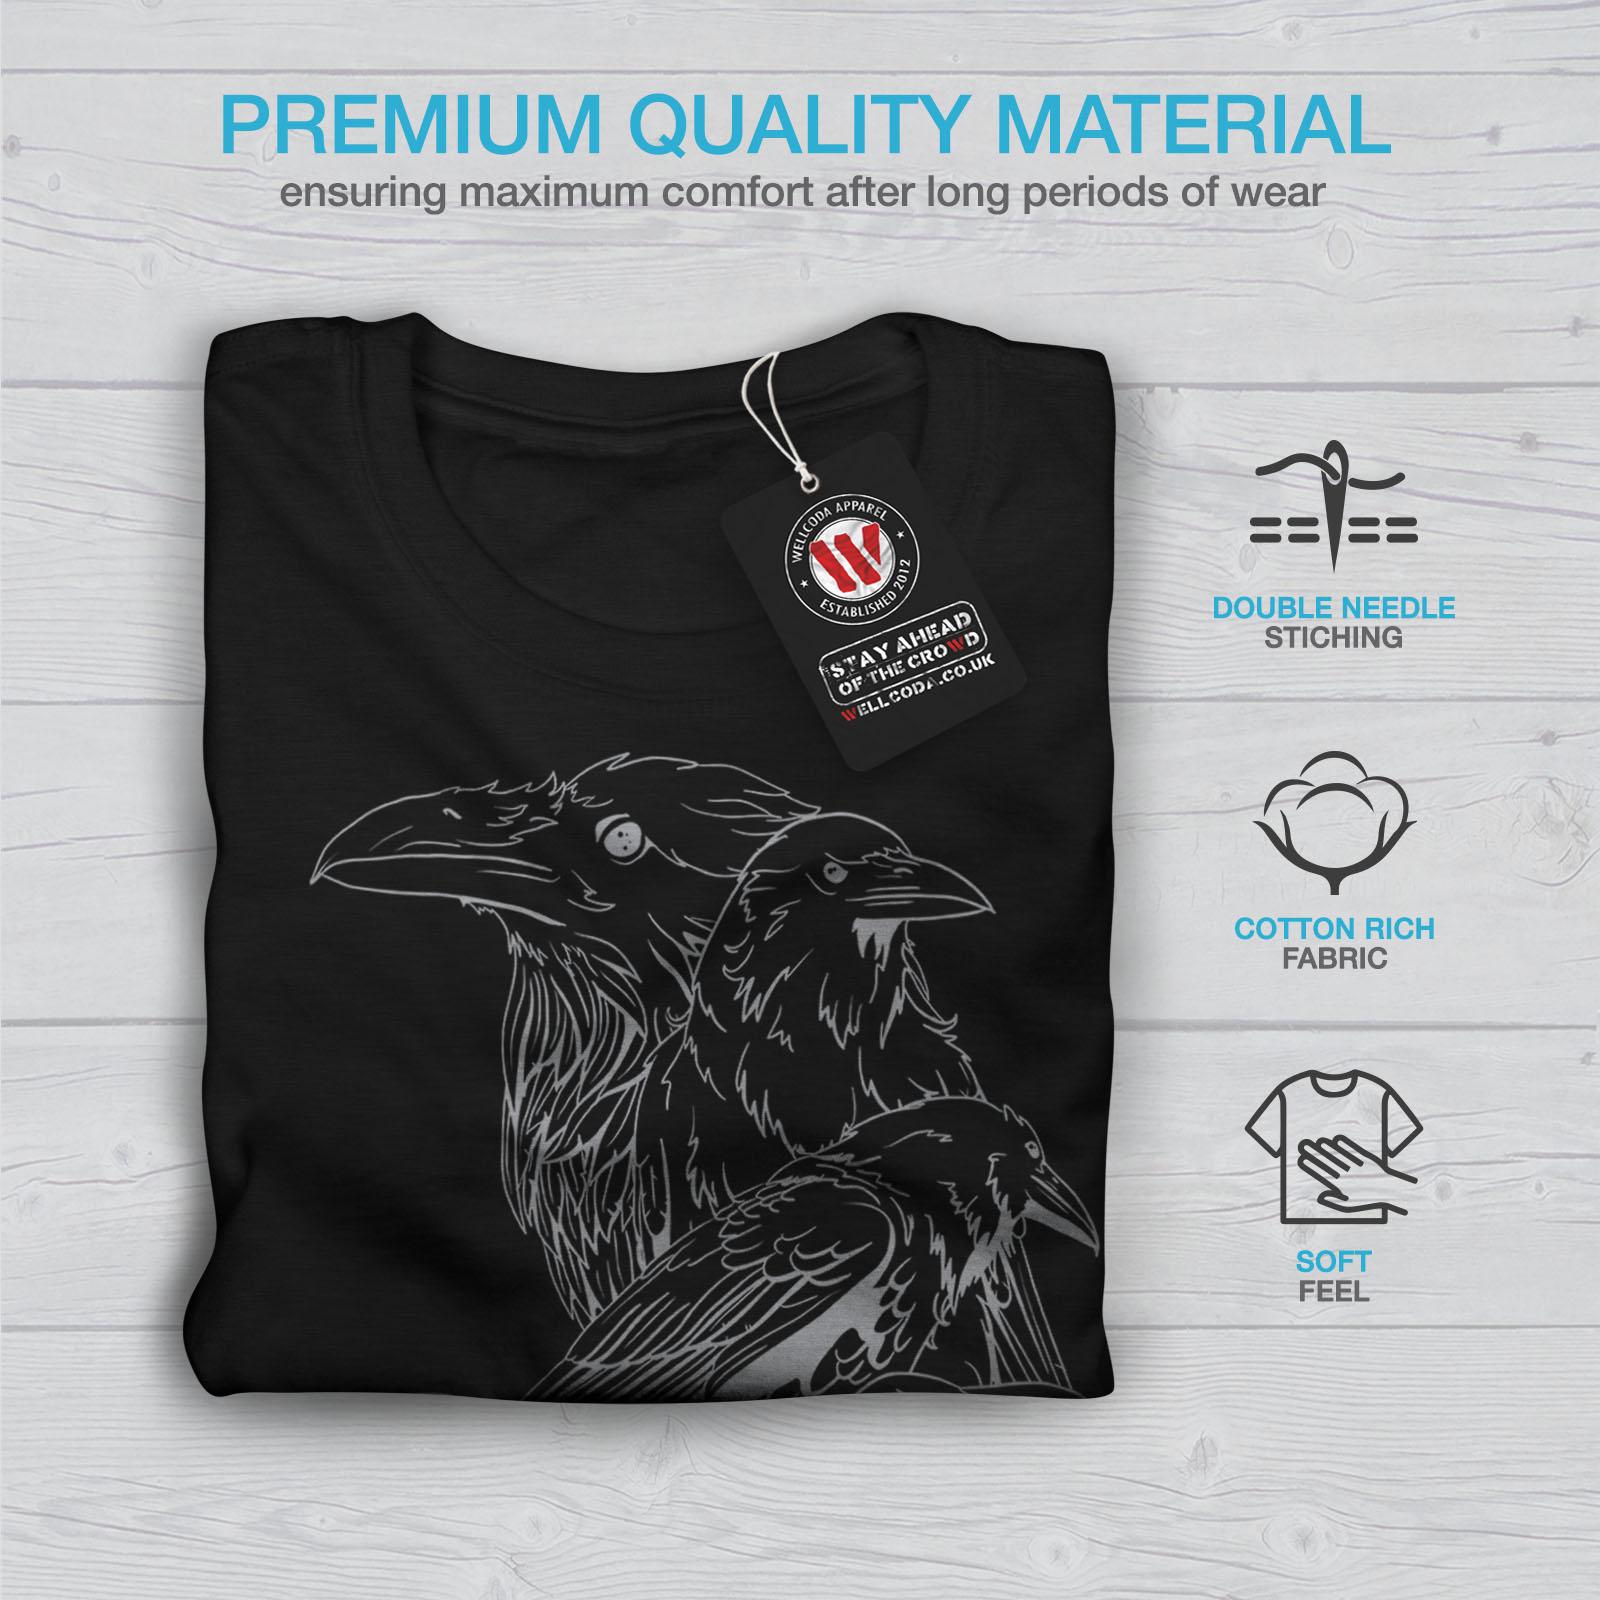 miniature 7 - Wellcoda Four Scary Raven Mens T-shirt, Crow Birds Graphic Design Printed Tee